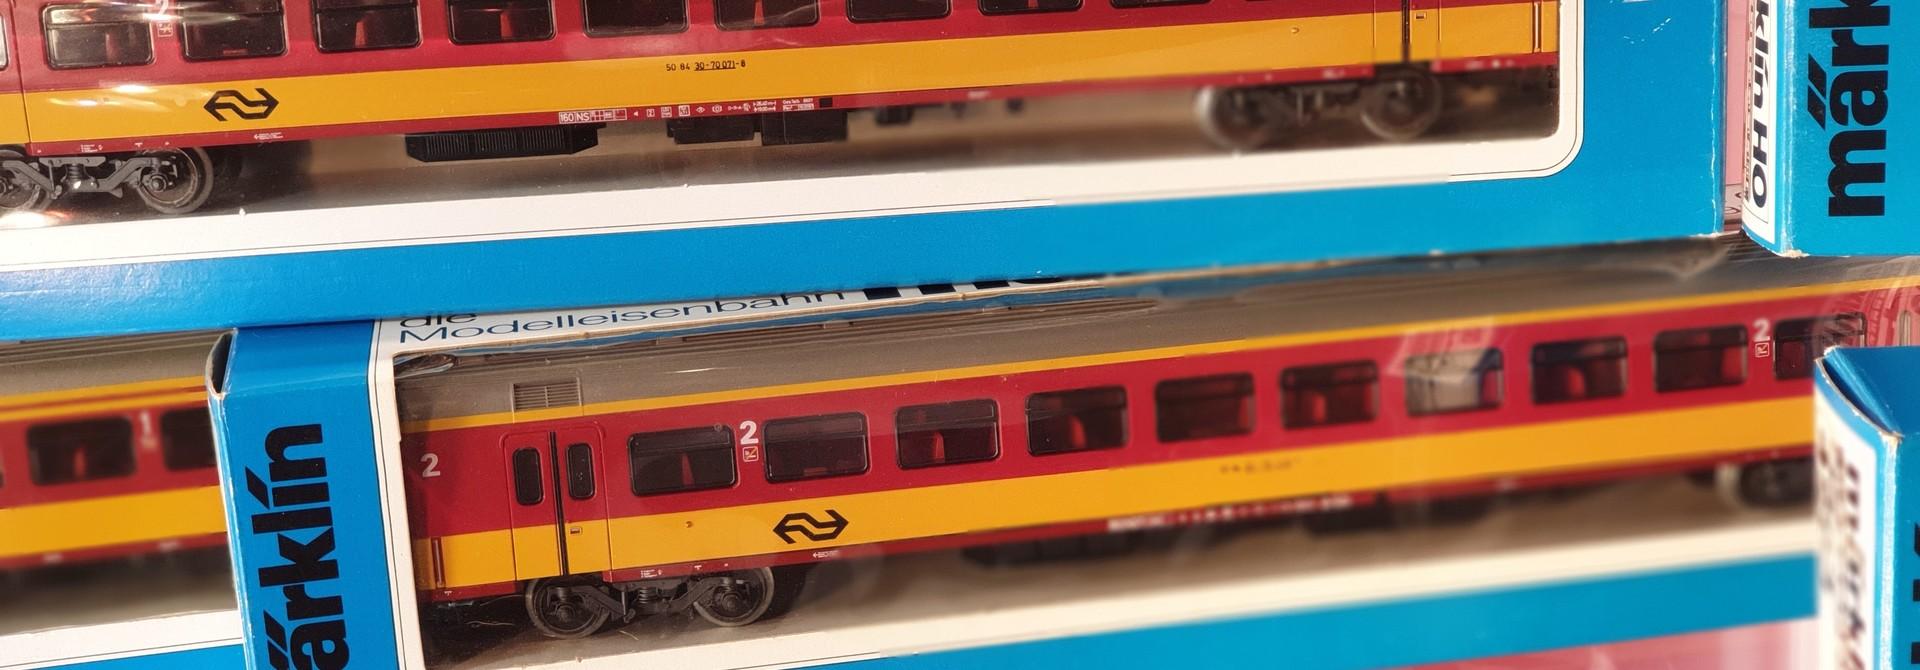 4262 Benelux Intercity rijtuig 1/2e klasse